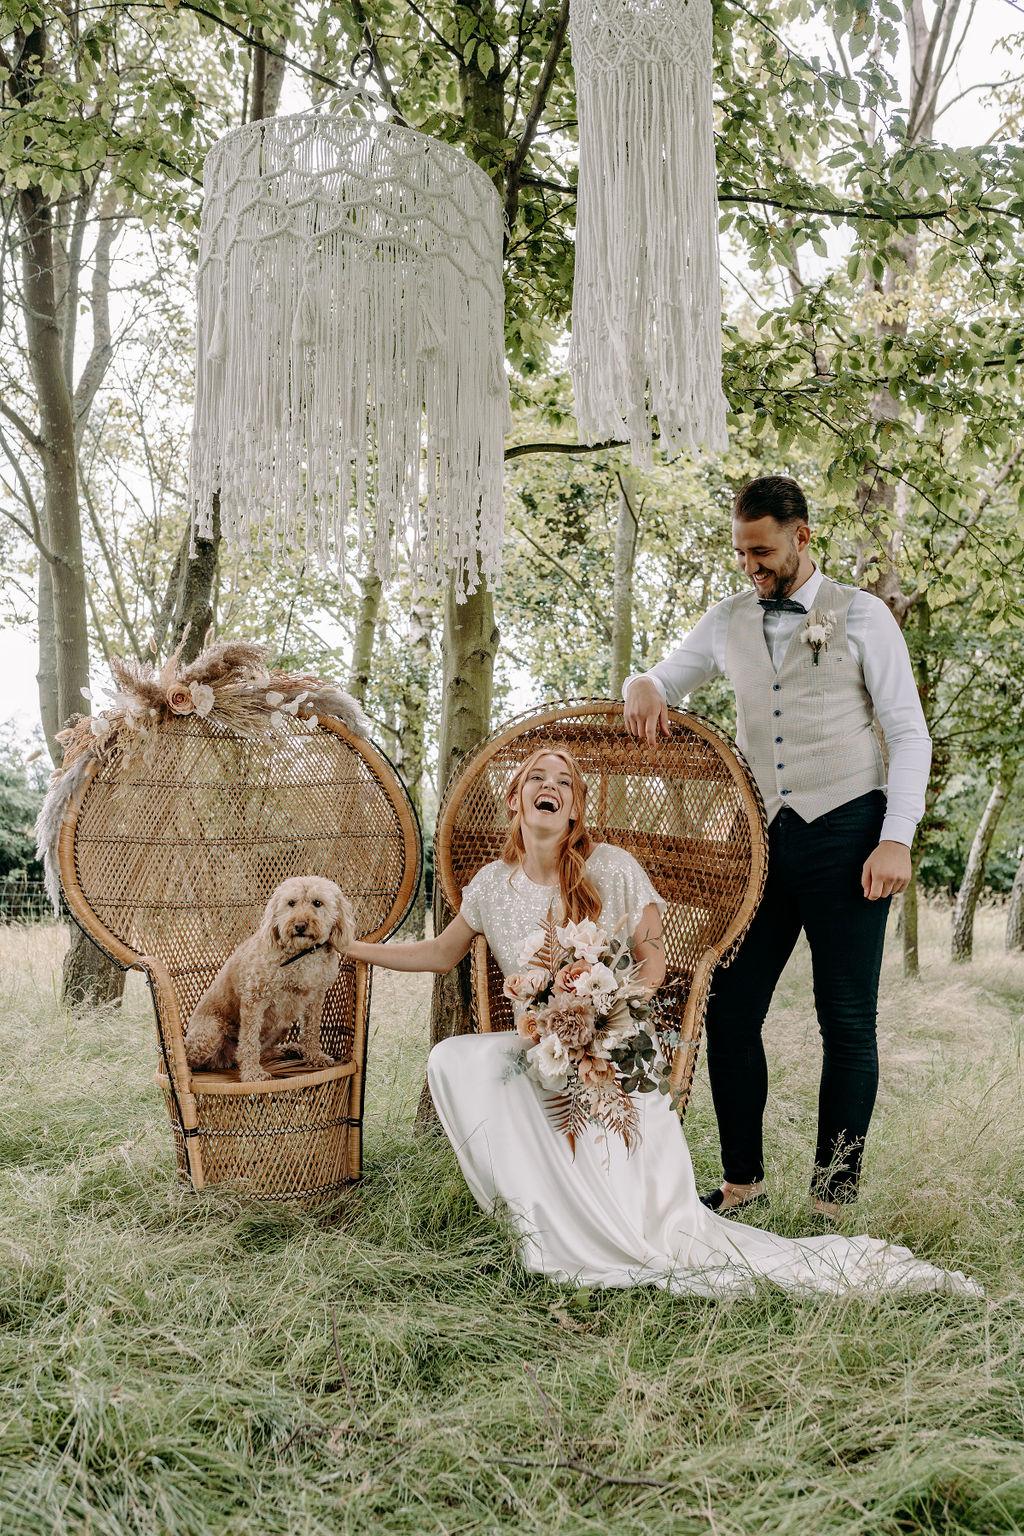 sustainable boho wedding - vintage wedding styling - wedding chair rental - wedding wicker chair - bohemian wedding - small wedding